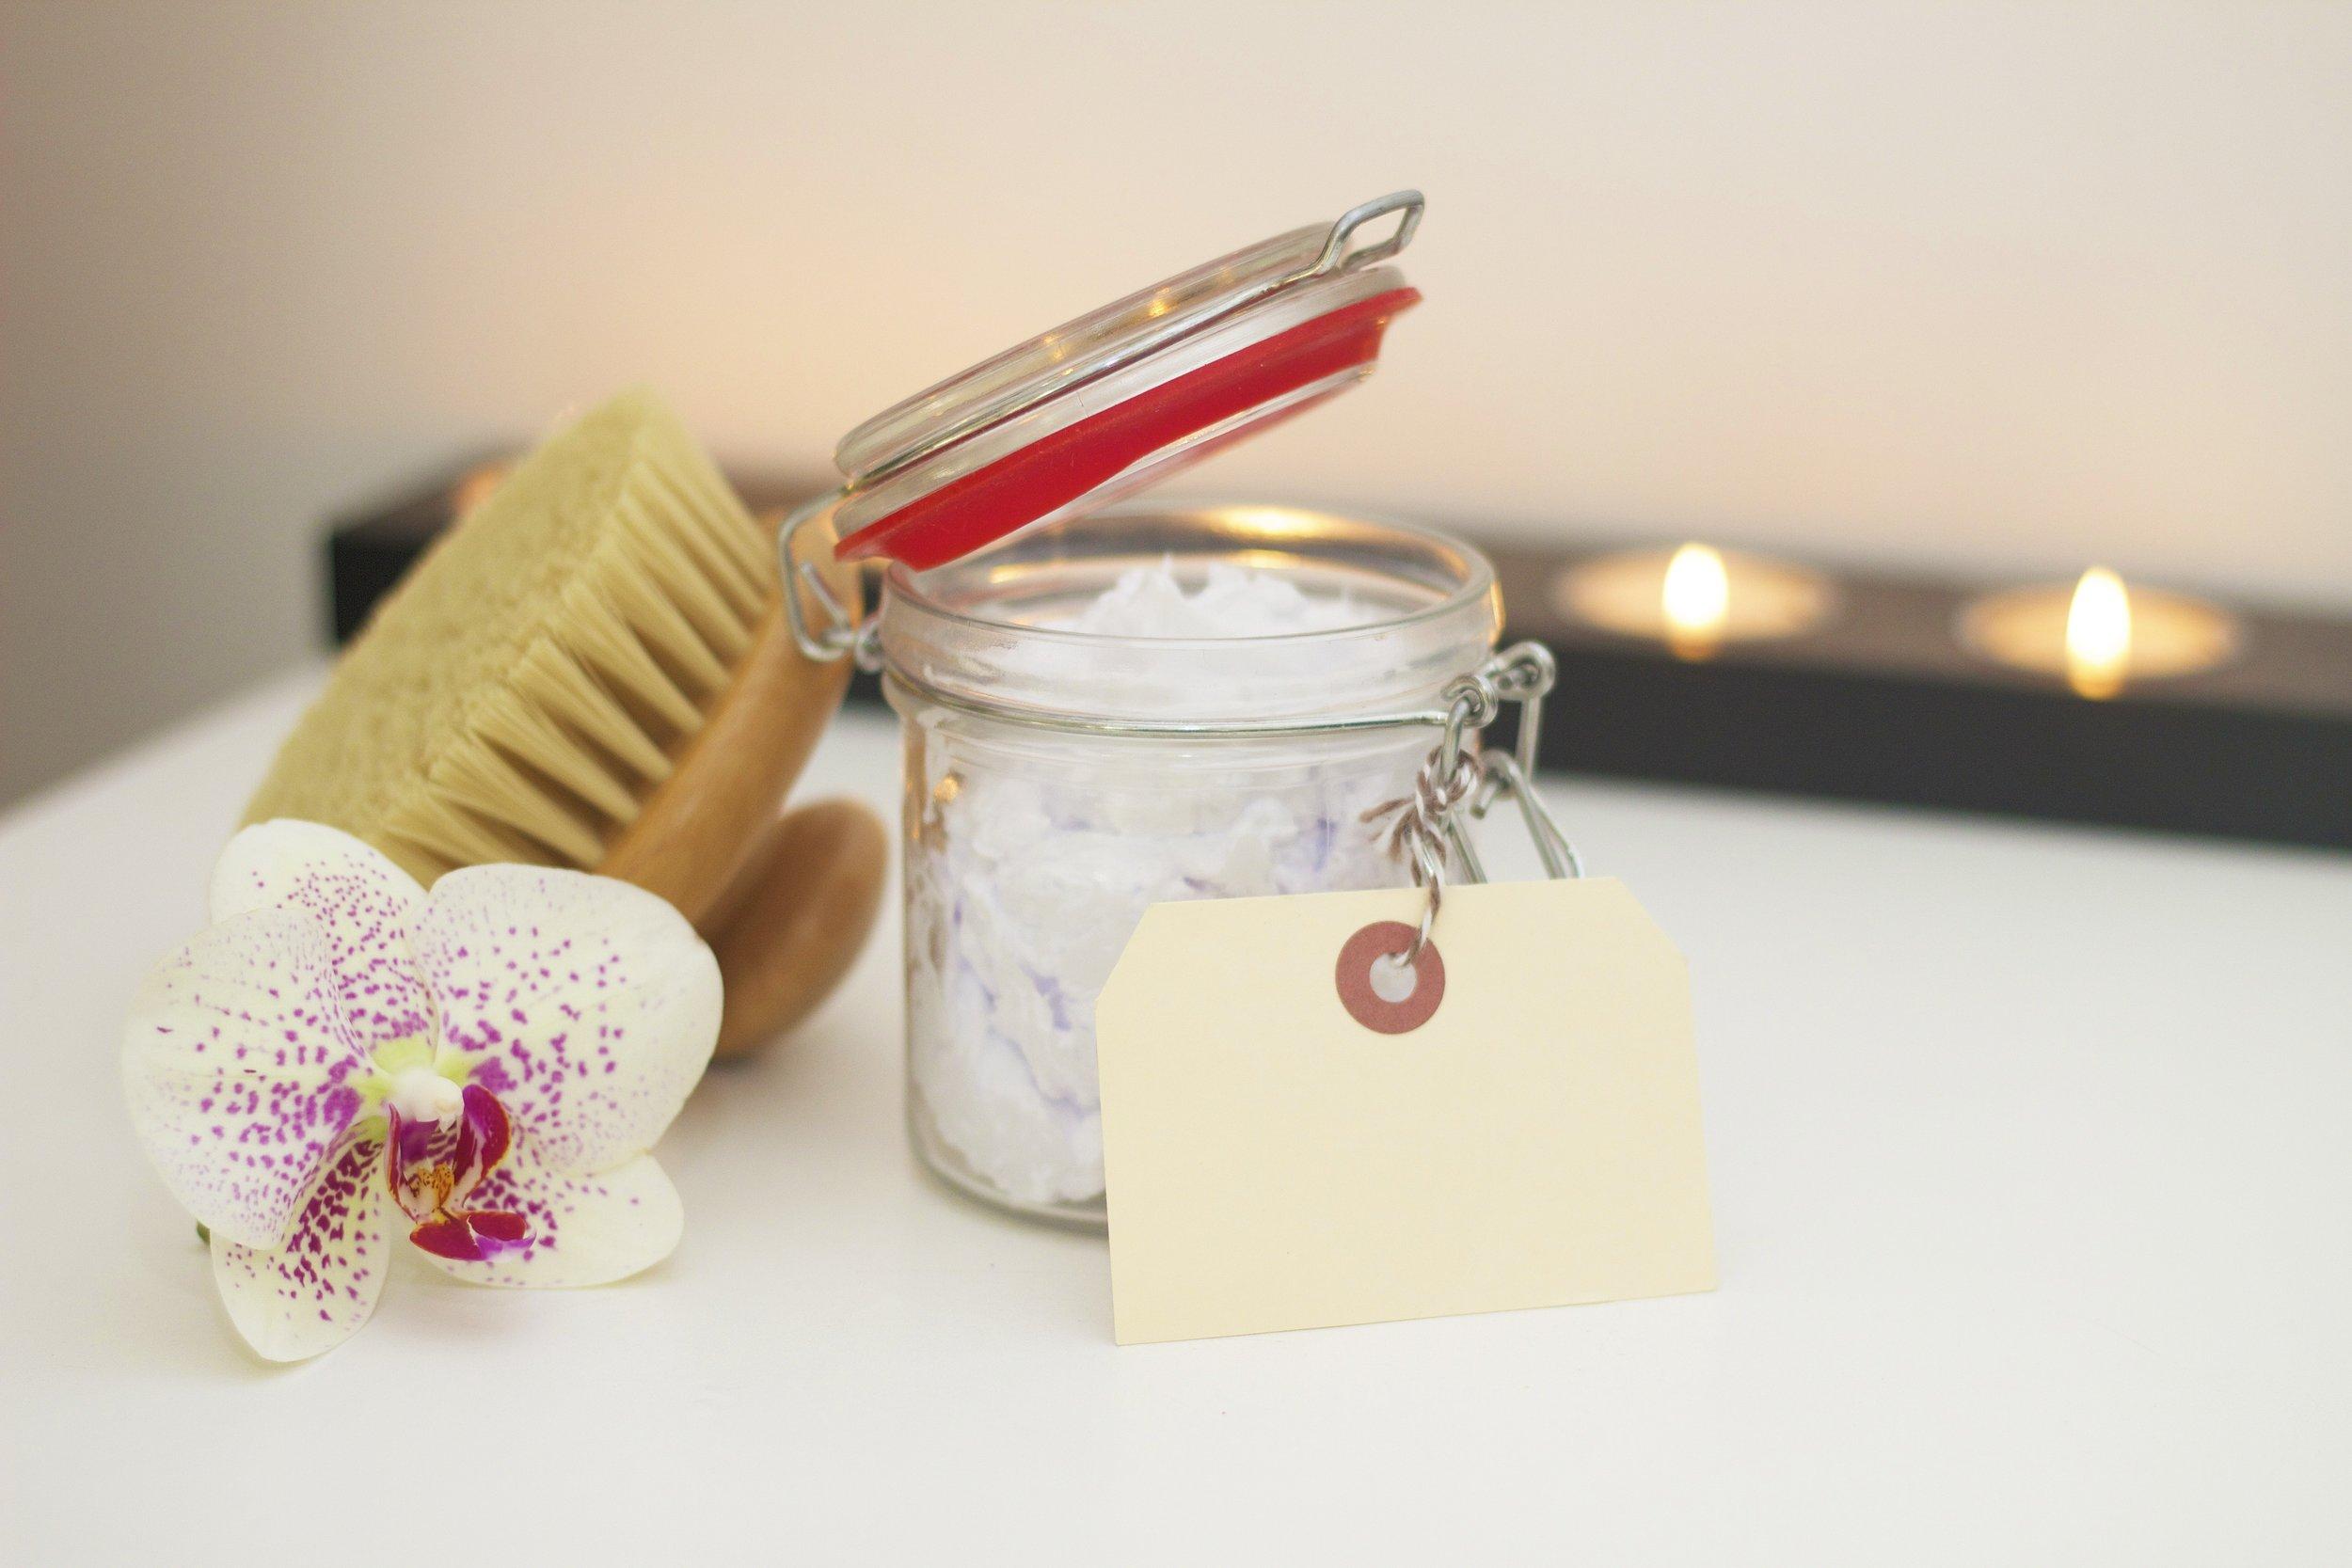 bath-blur-brush-275765.jpg